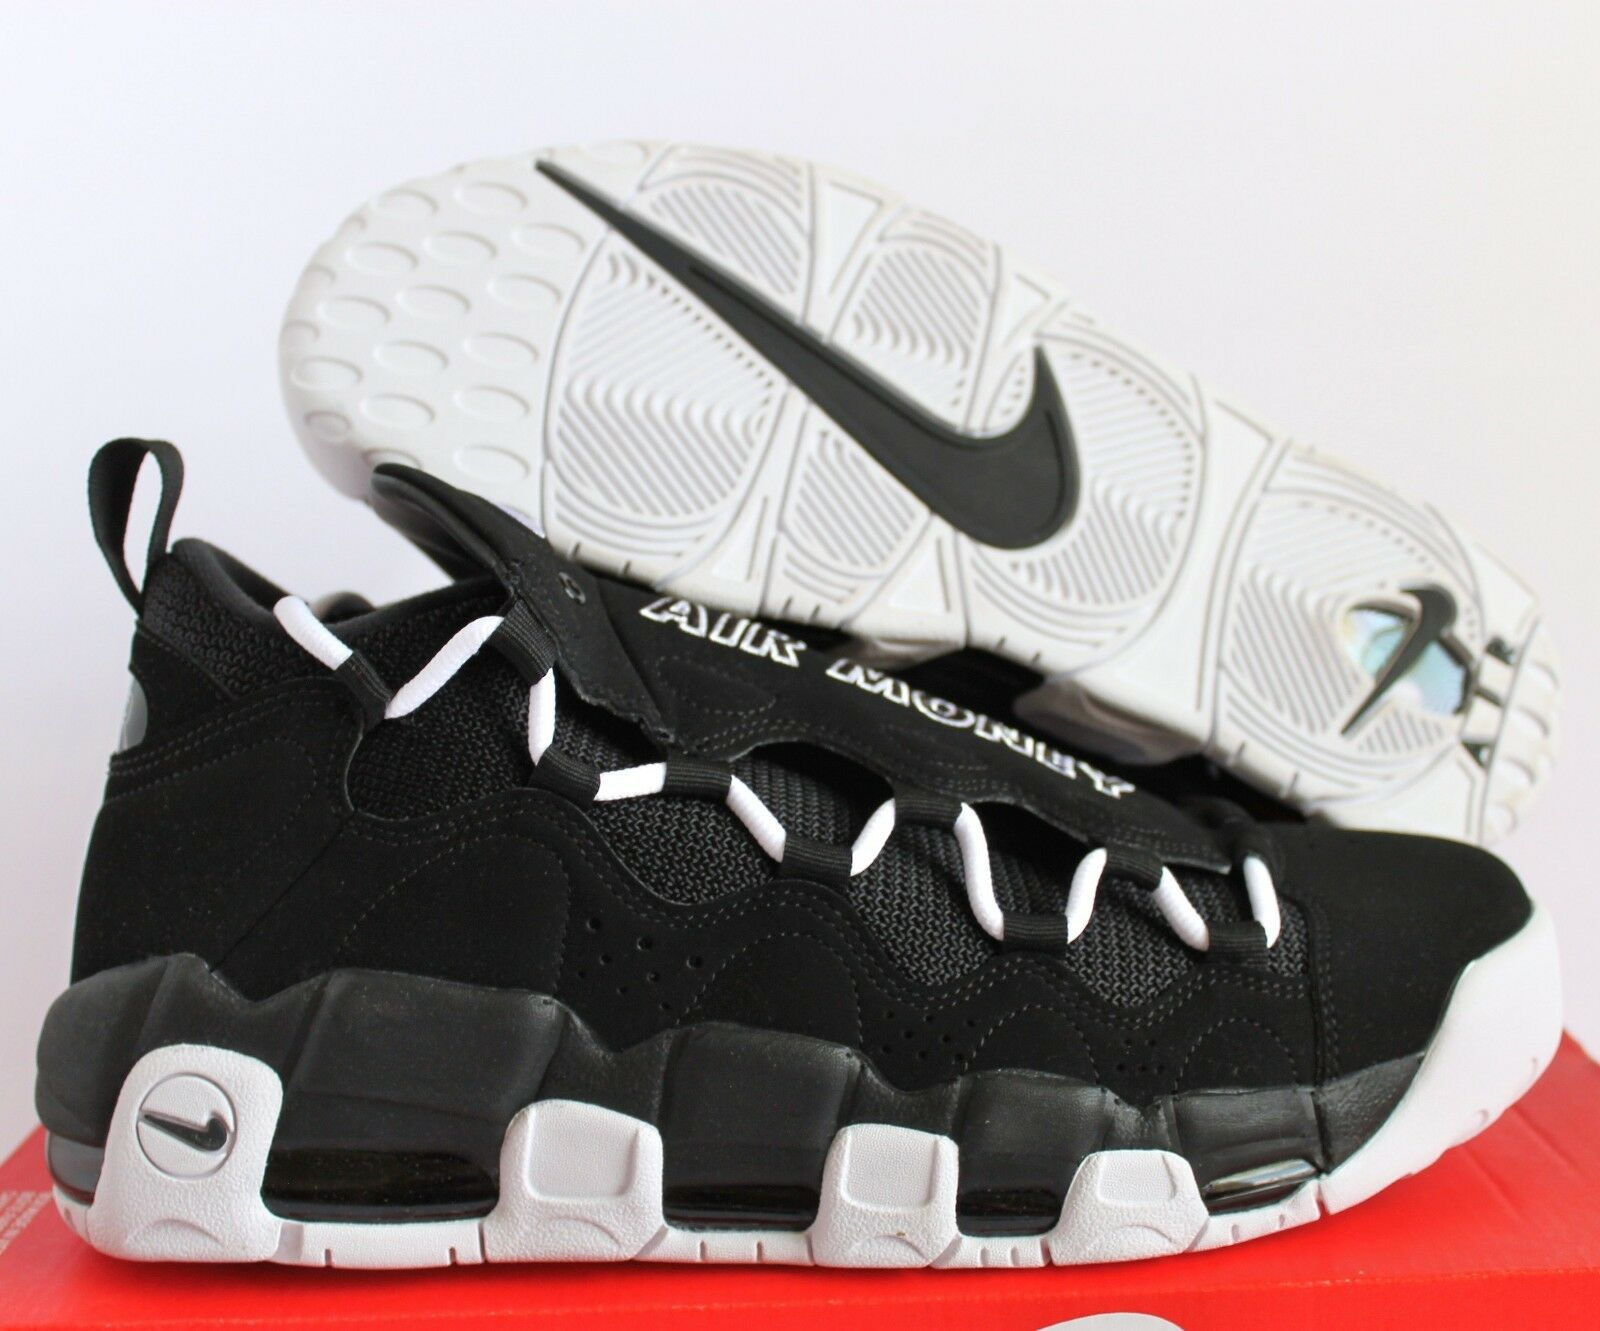 Nike uomini aria piu 'soldi nero-white-nero sz 11 [aj2998-001]